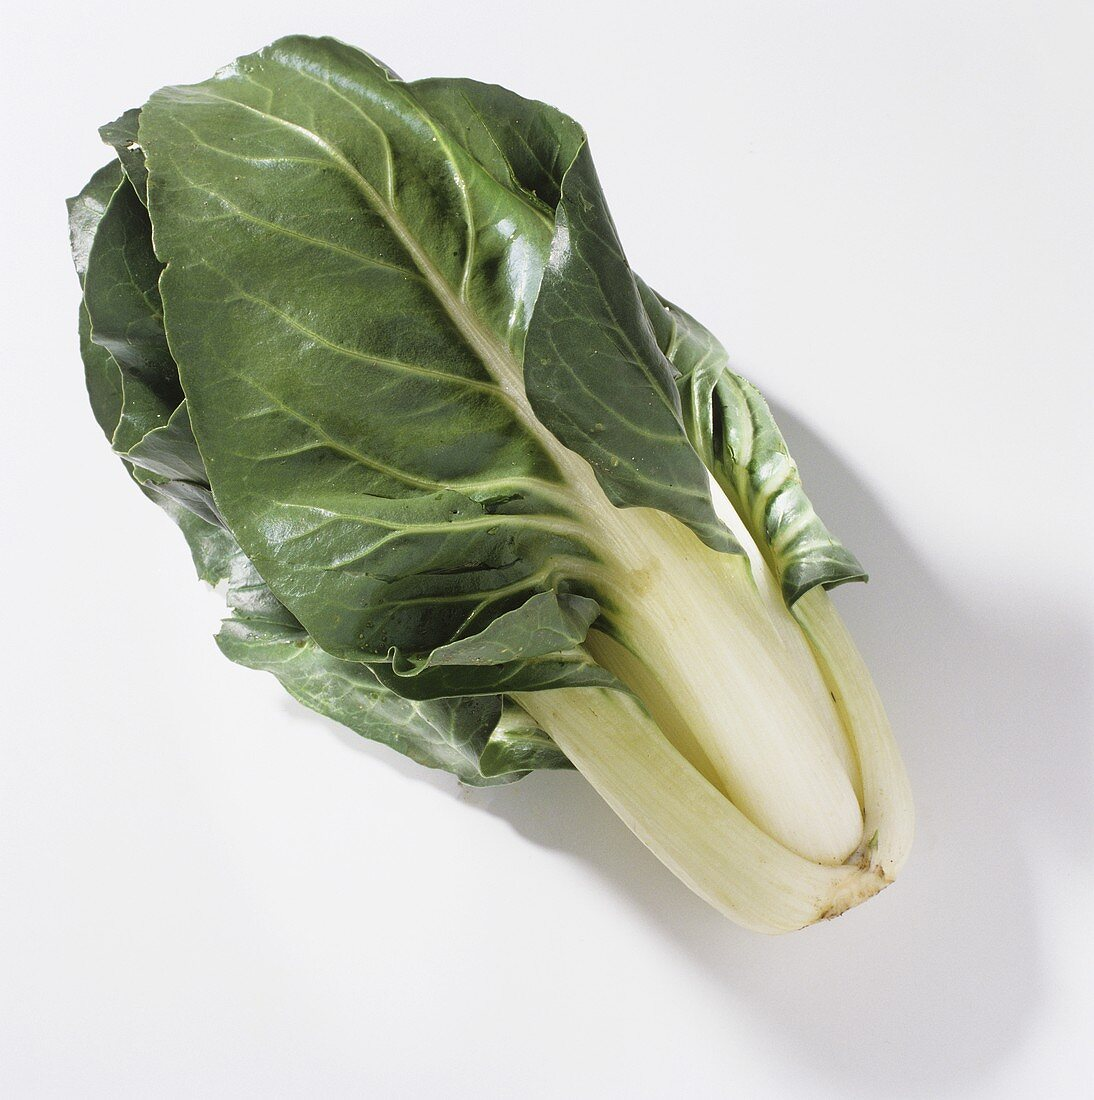 Leaf beet (Swiss chard with white stalk)